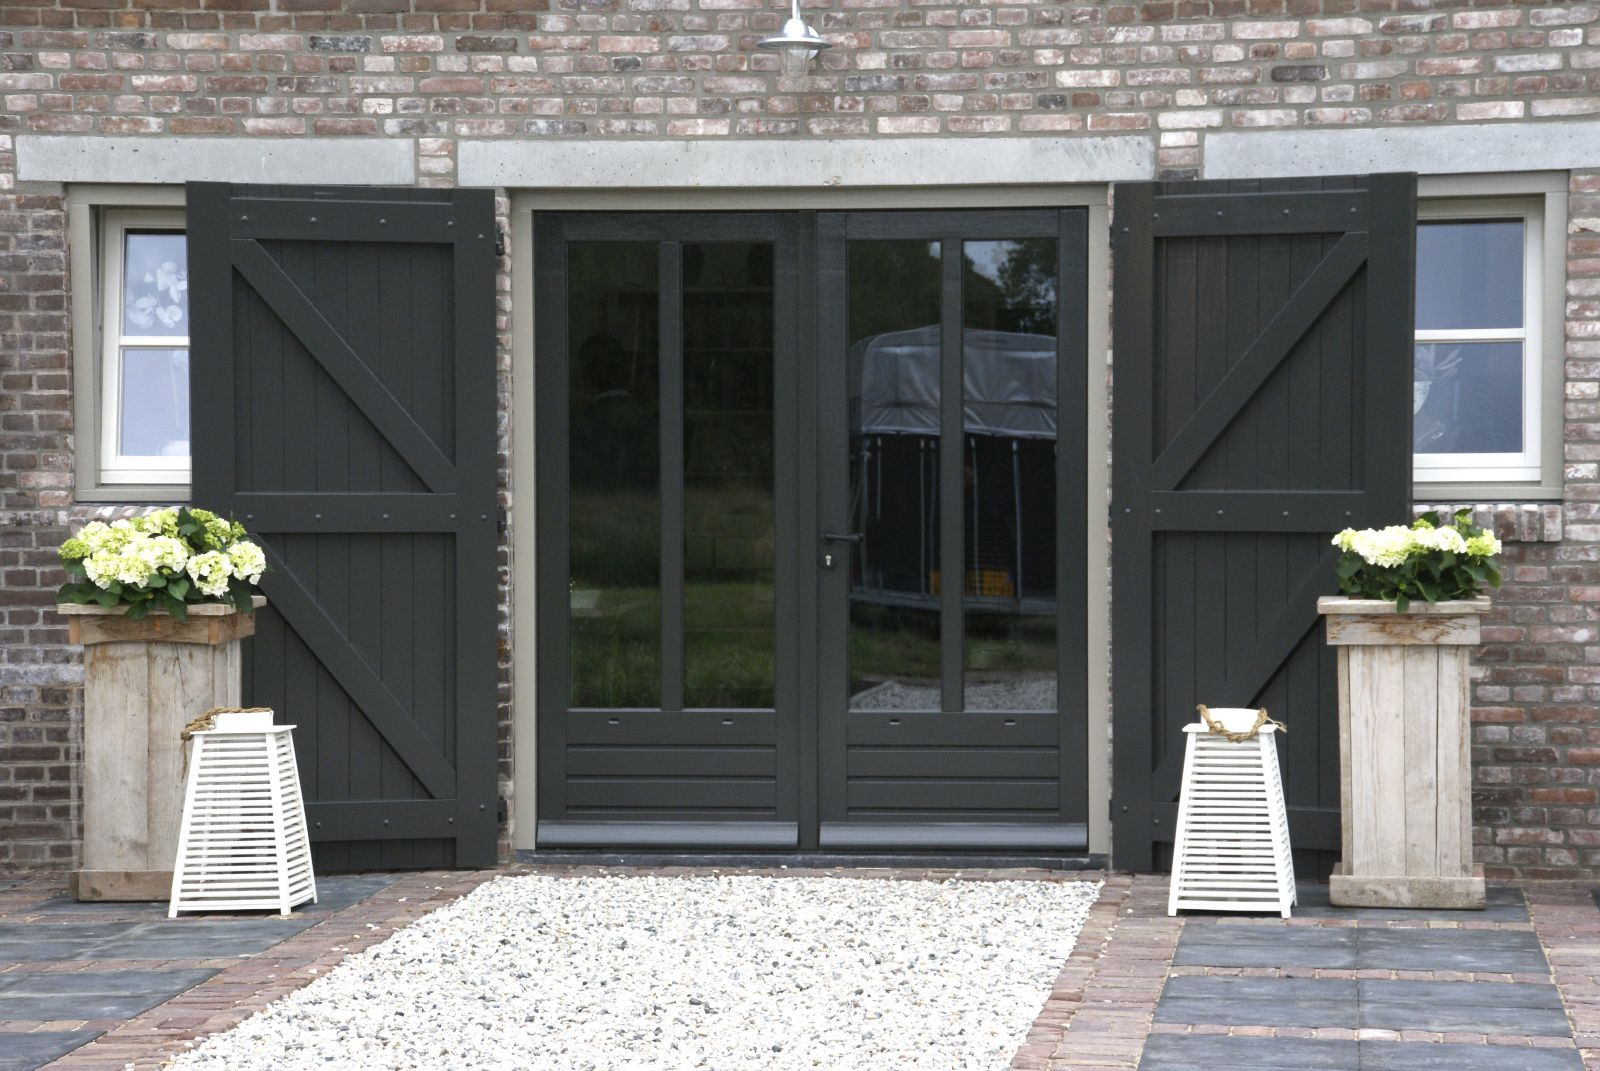 1000  images about verf je deuren / painting doors. on pinterest ...